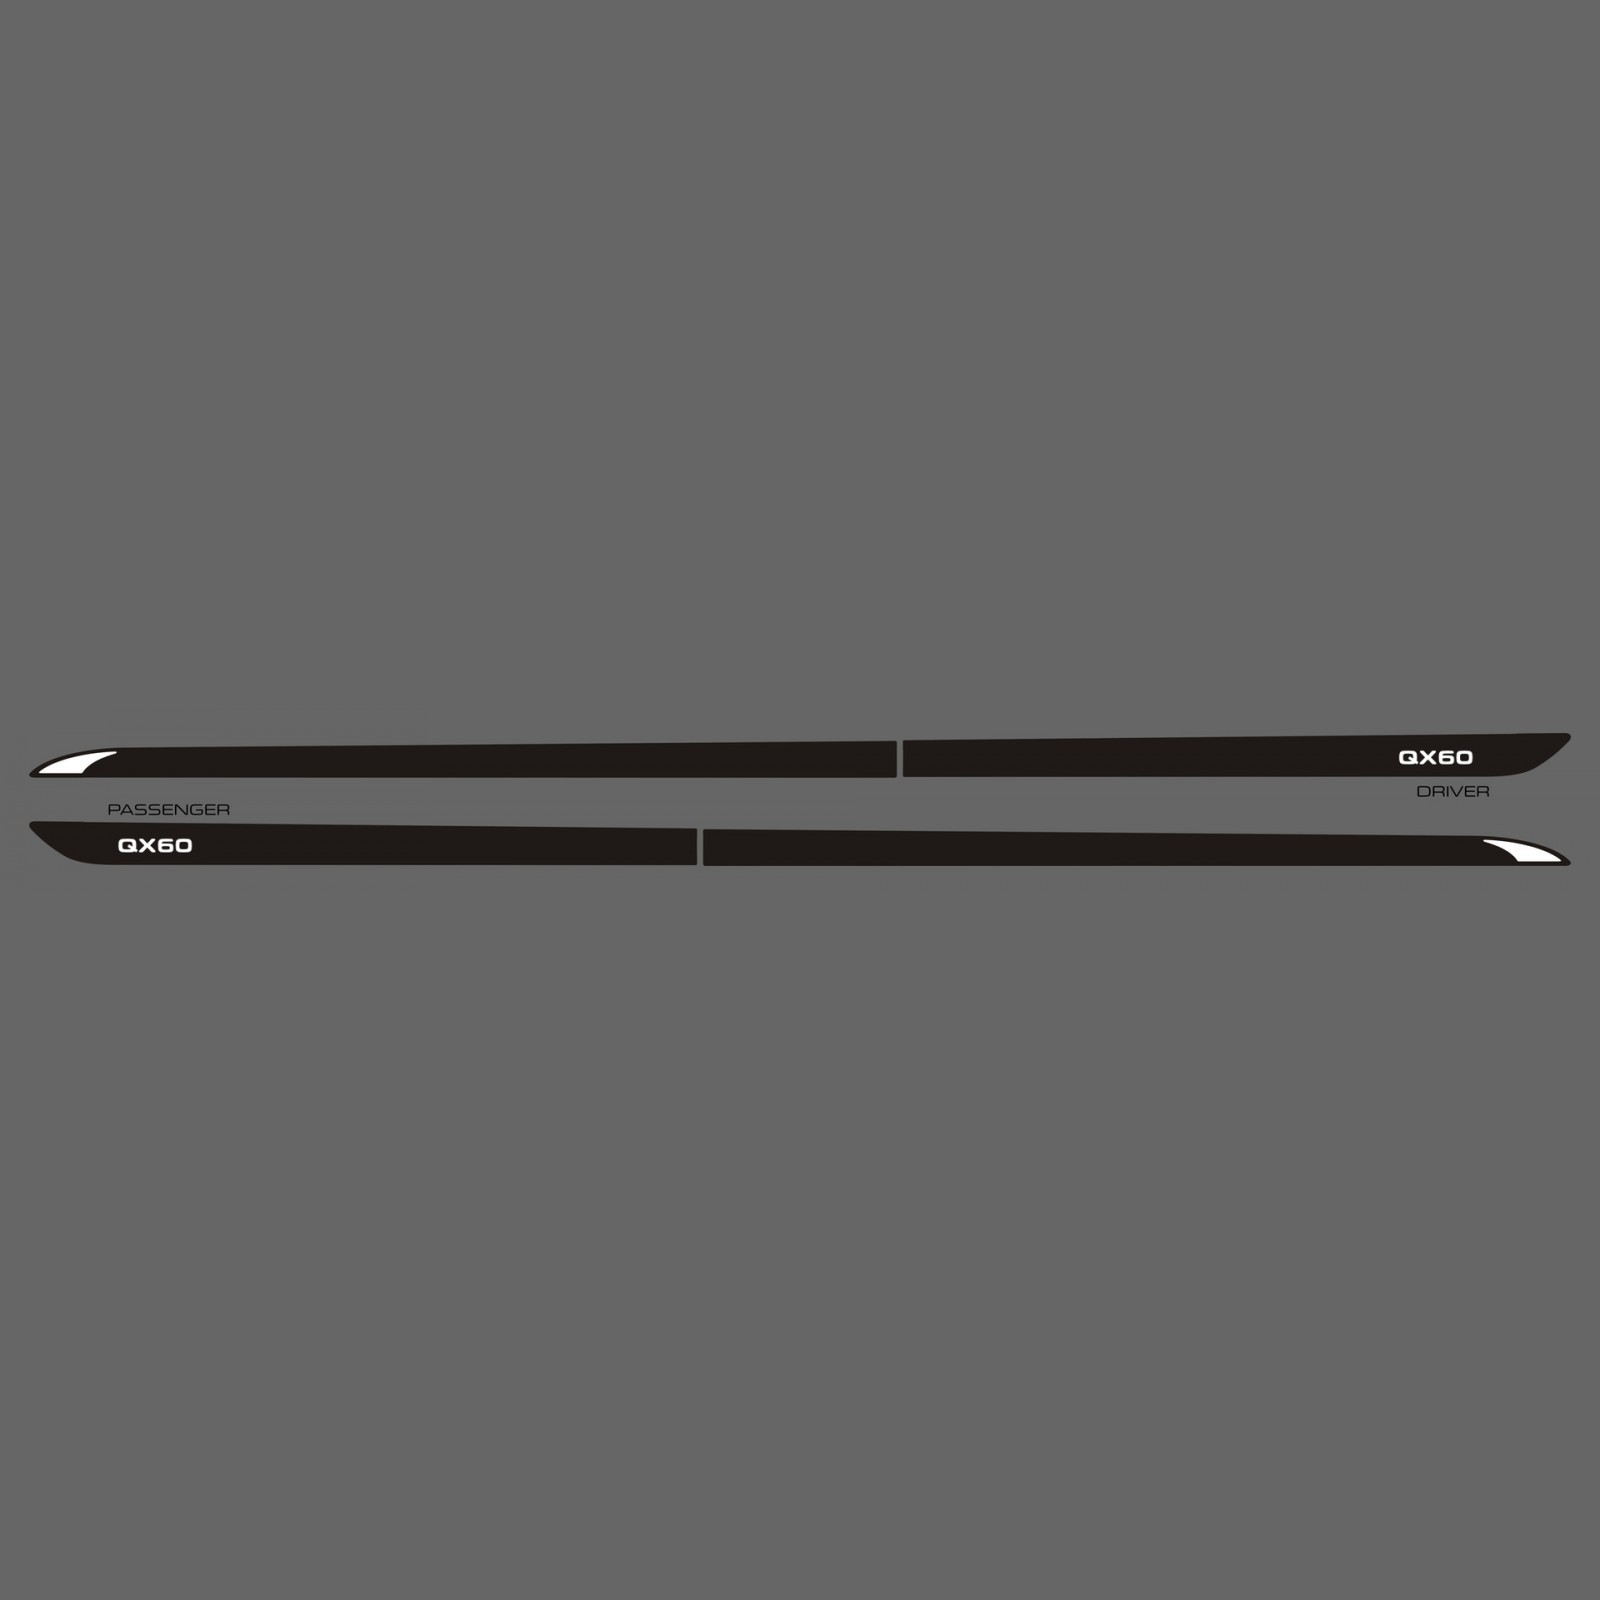 2019 Infiniti Qx60: Body Side Moldings For 2019 Infiniti QX60 (SUV)